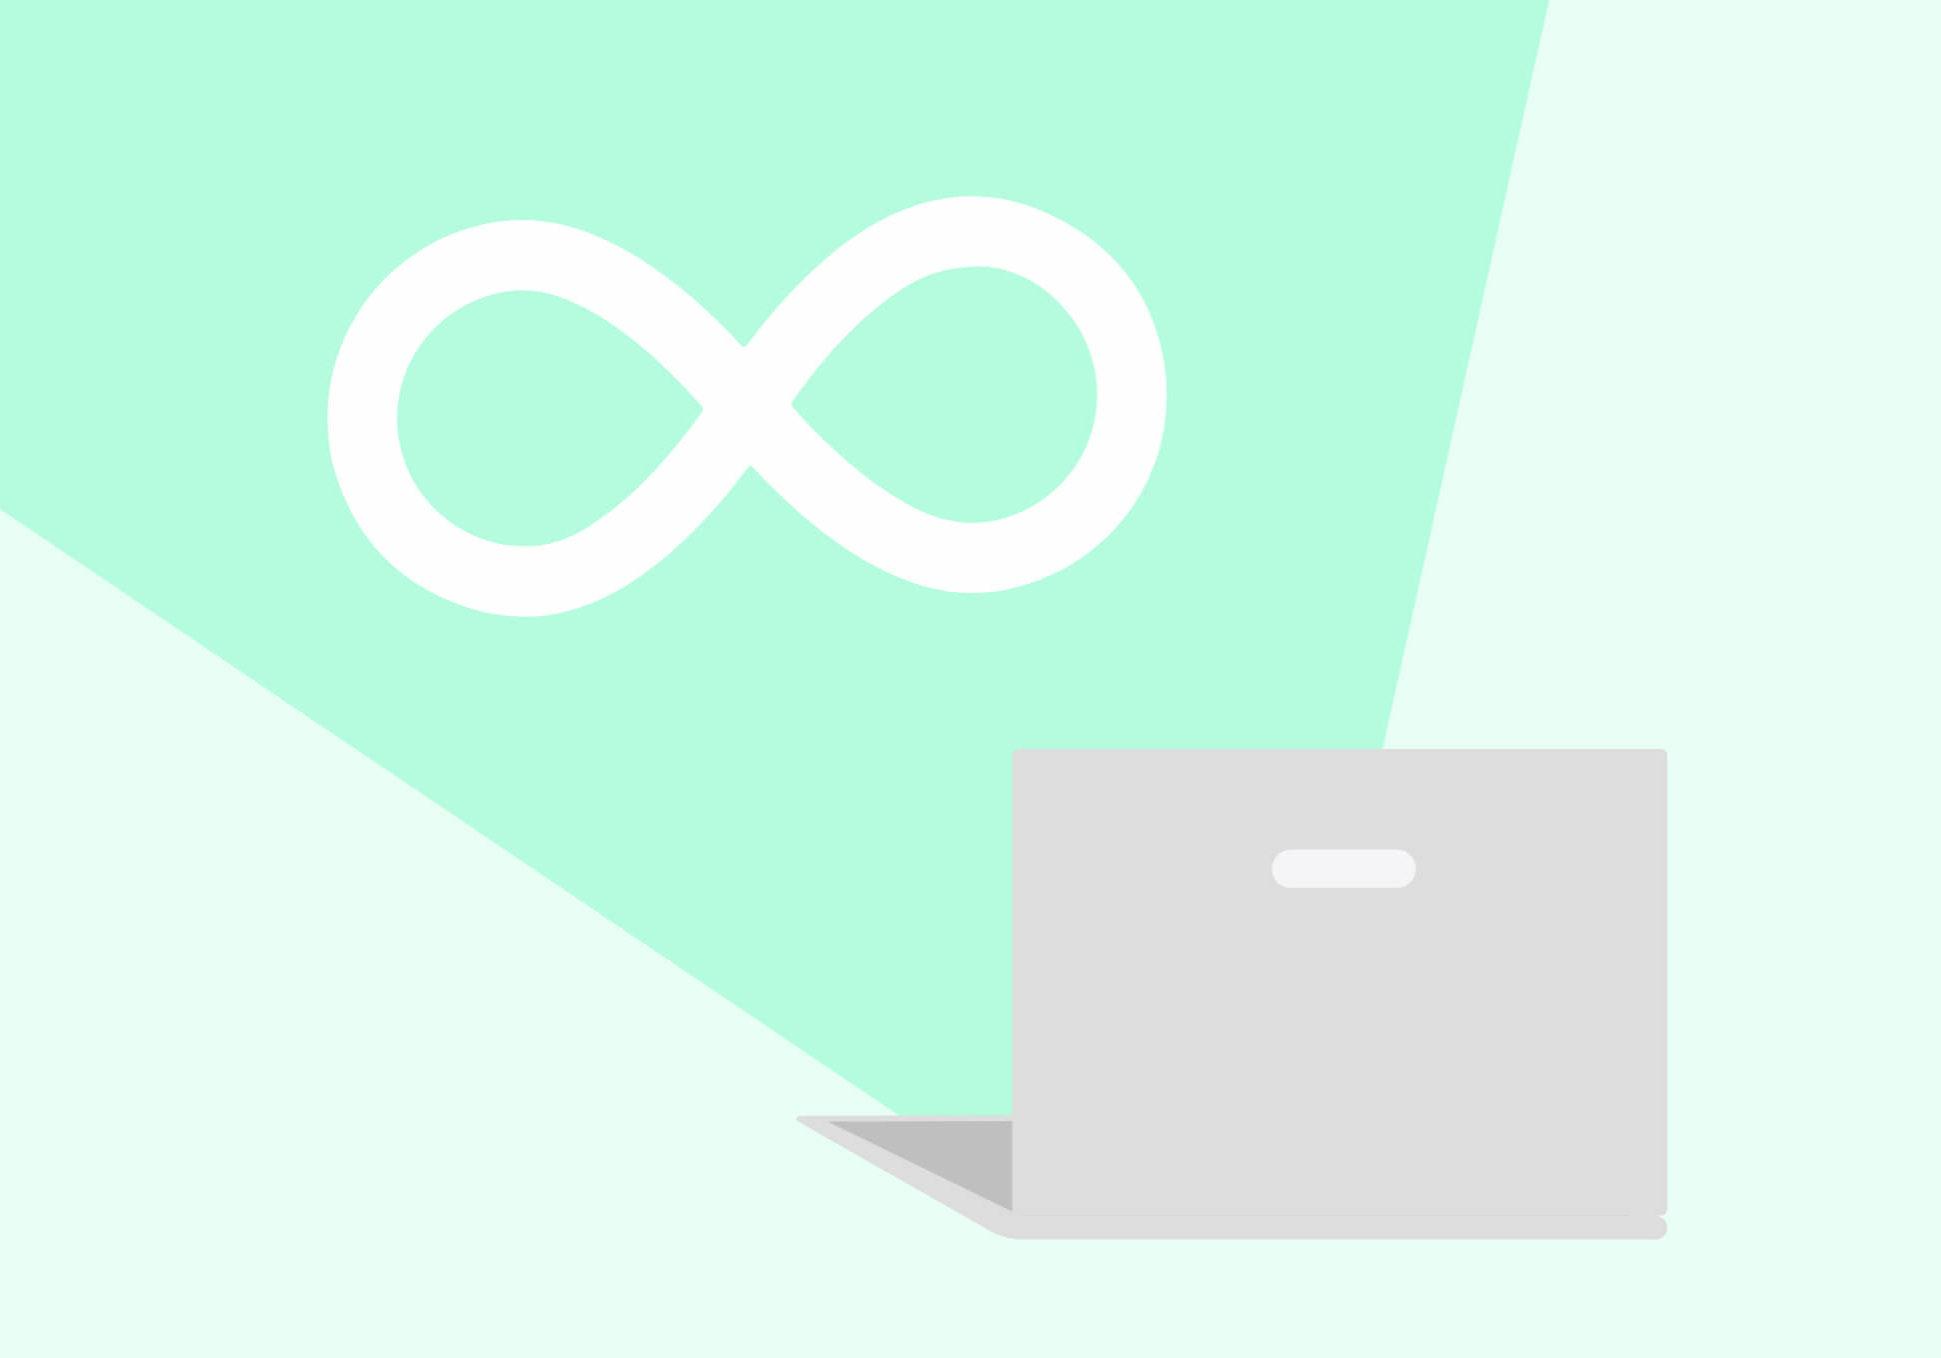 Infinity Image@2x-Compressed